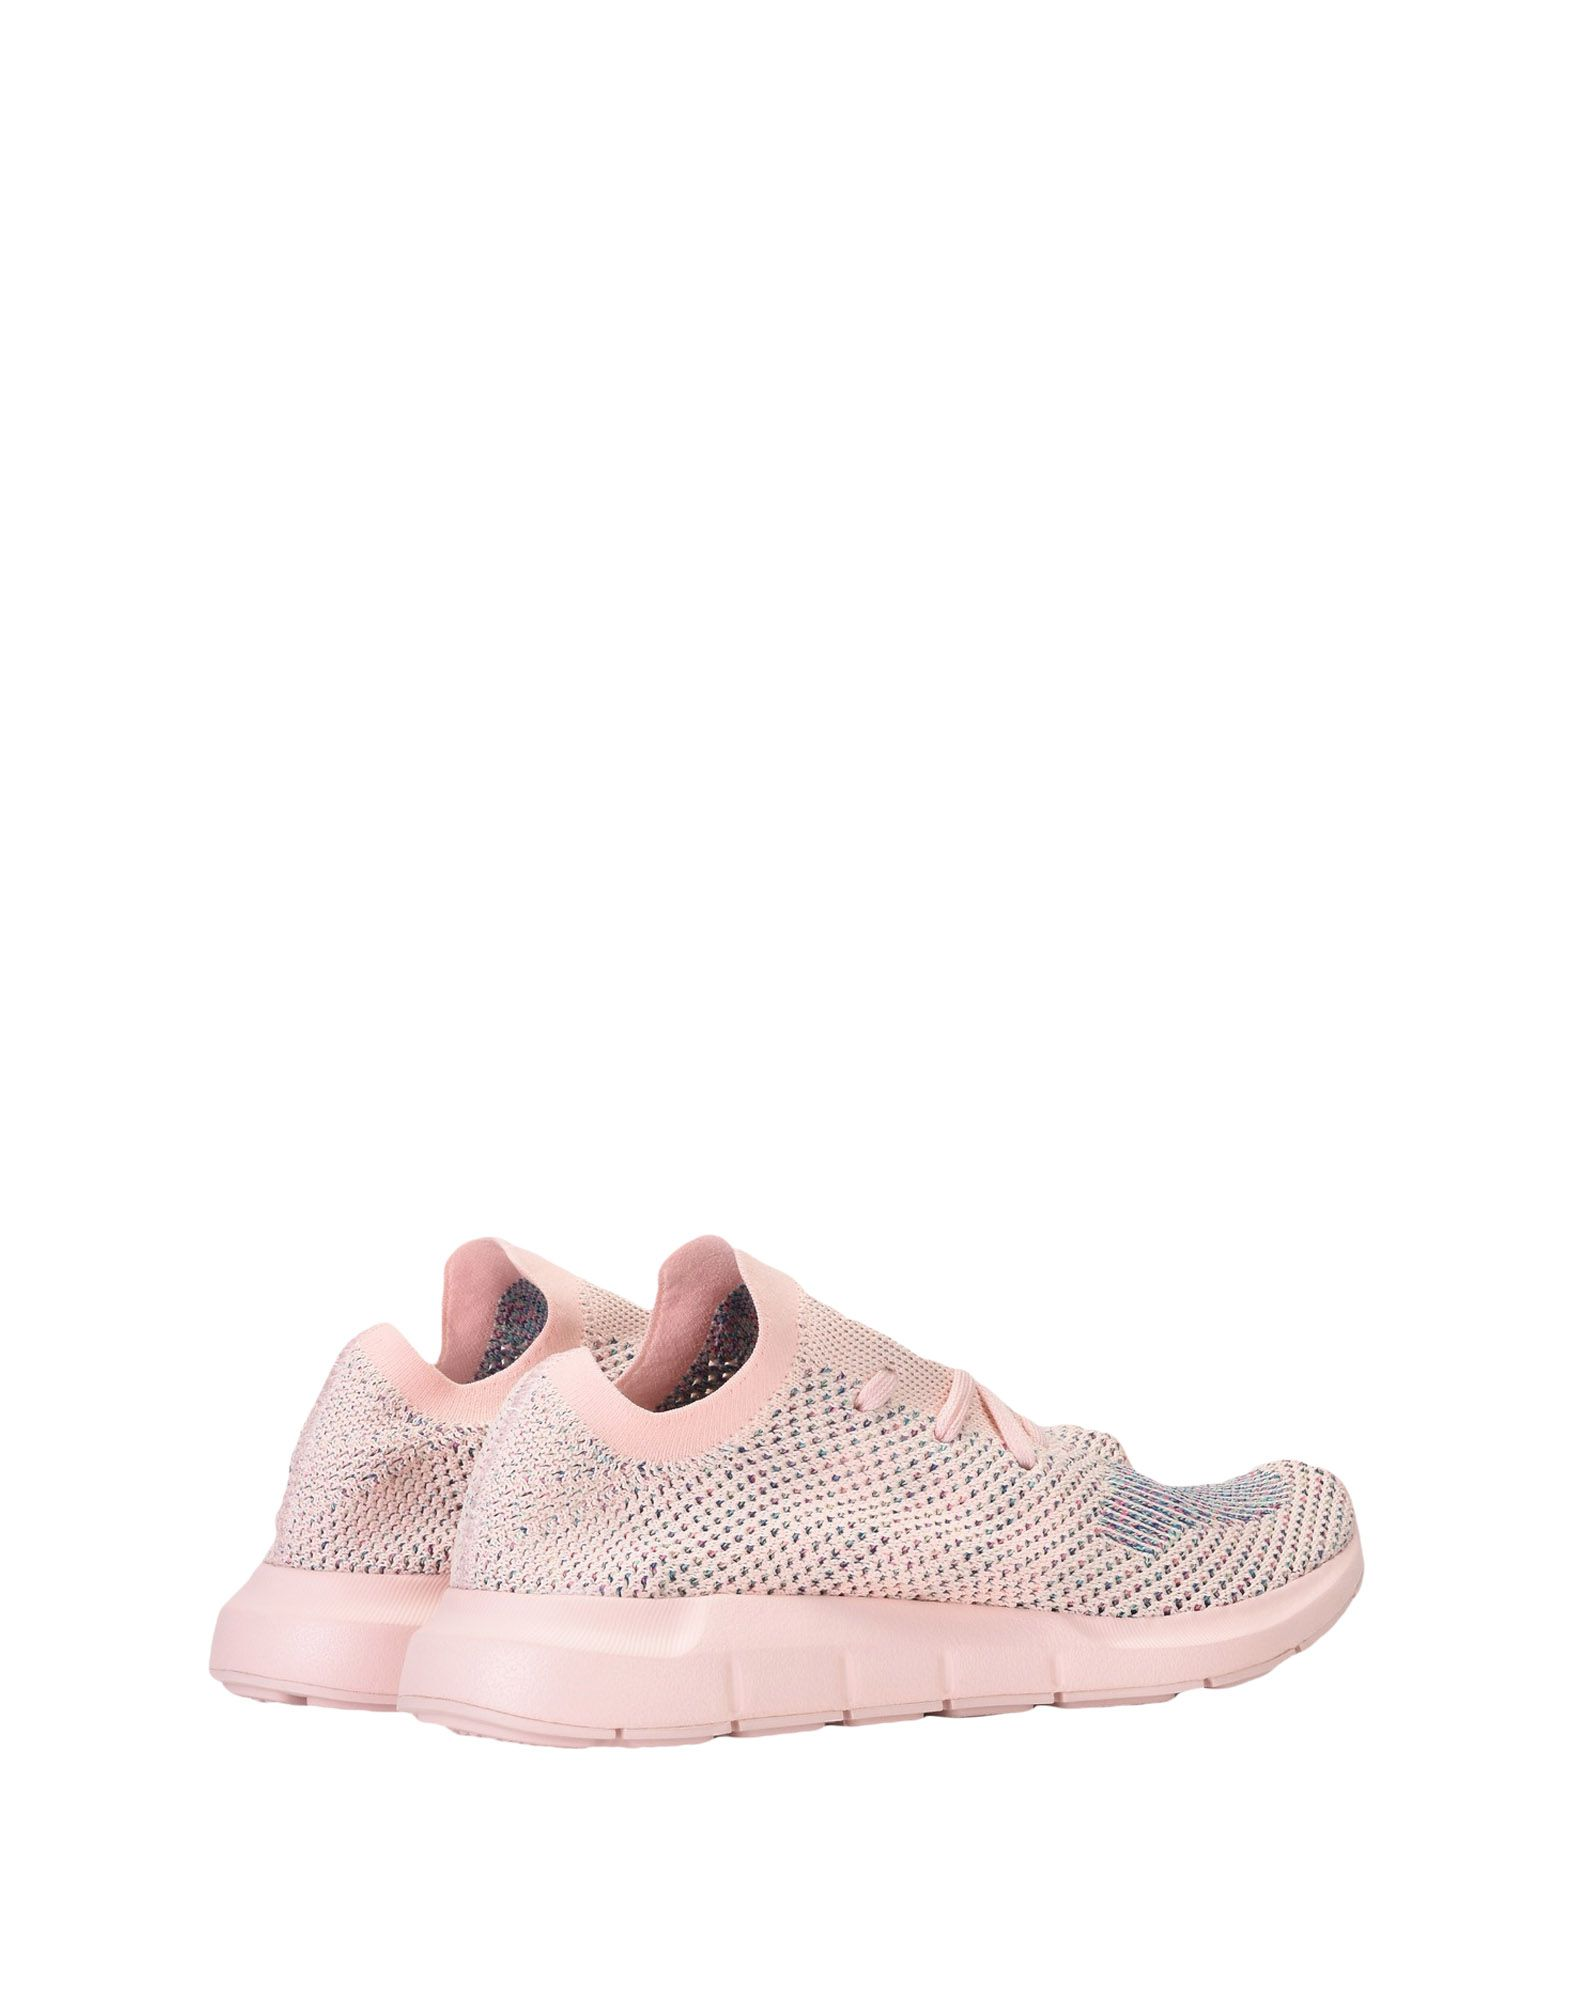 Sneakers Adidas Originals Swift Run Pk W - Donna - 11325680GP